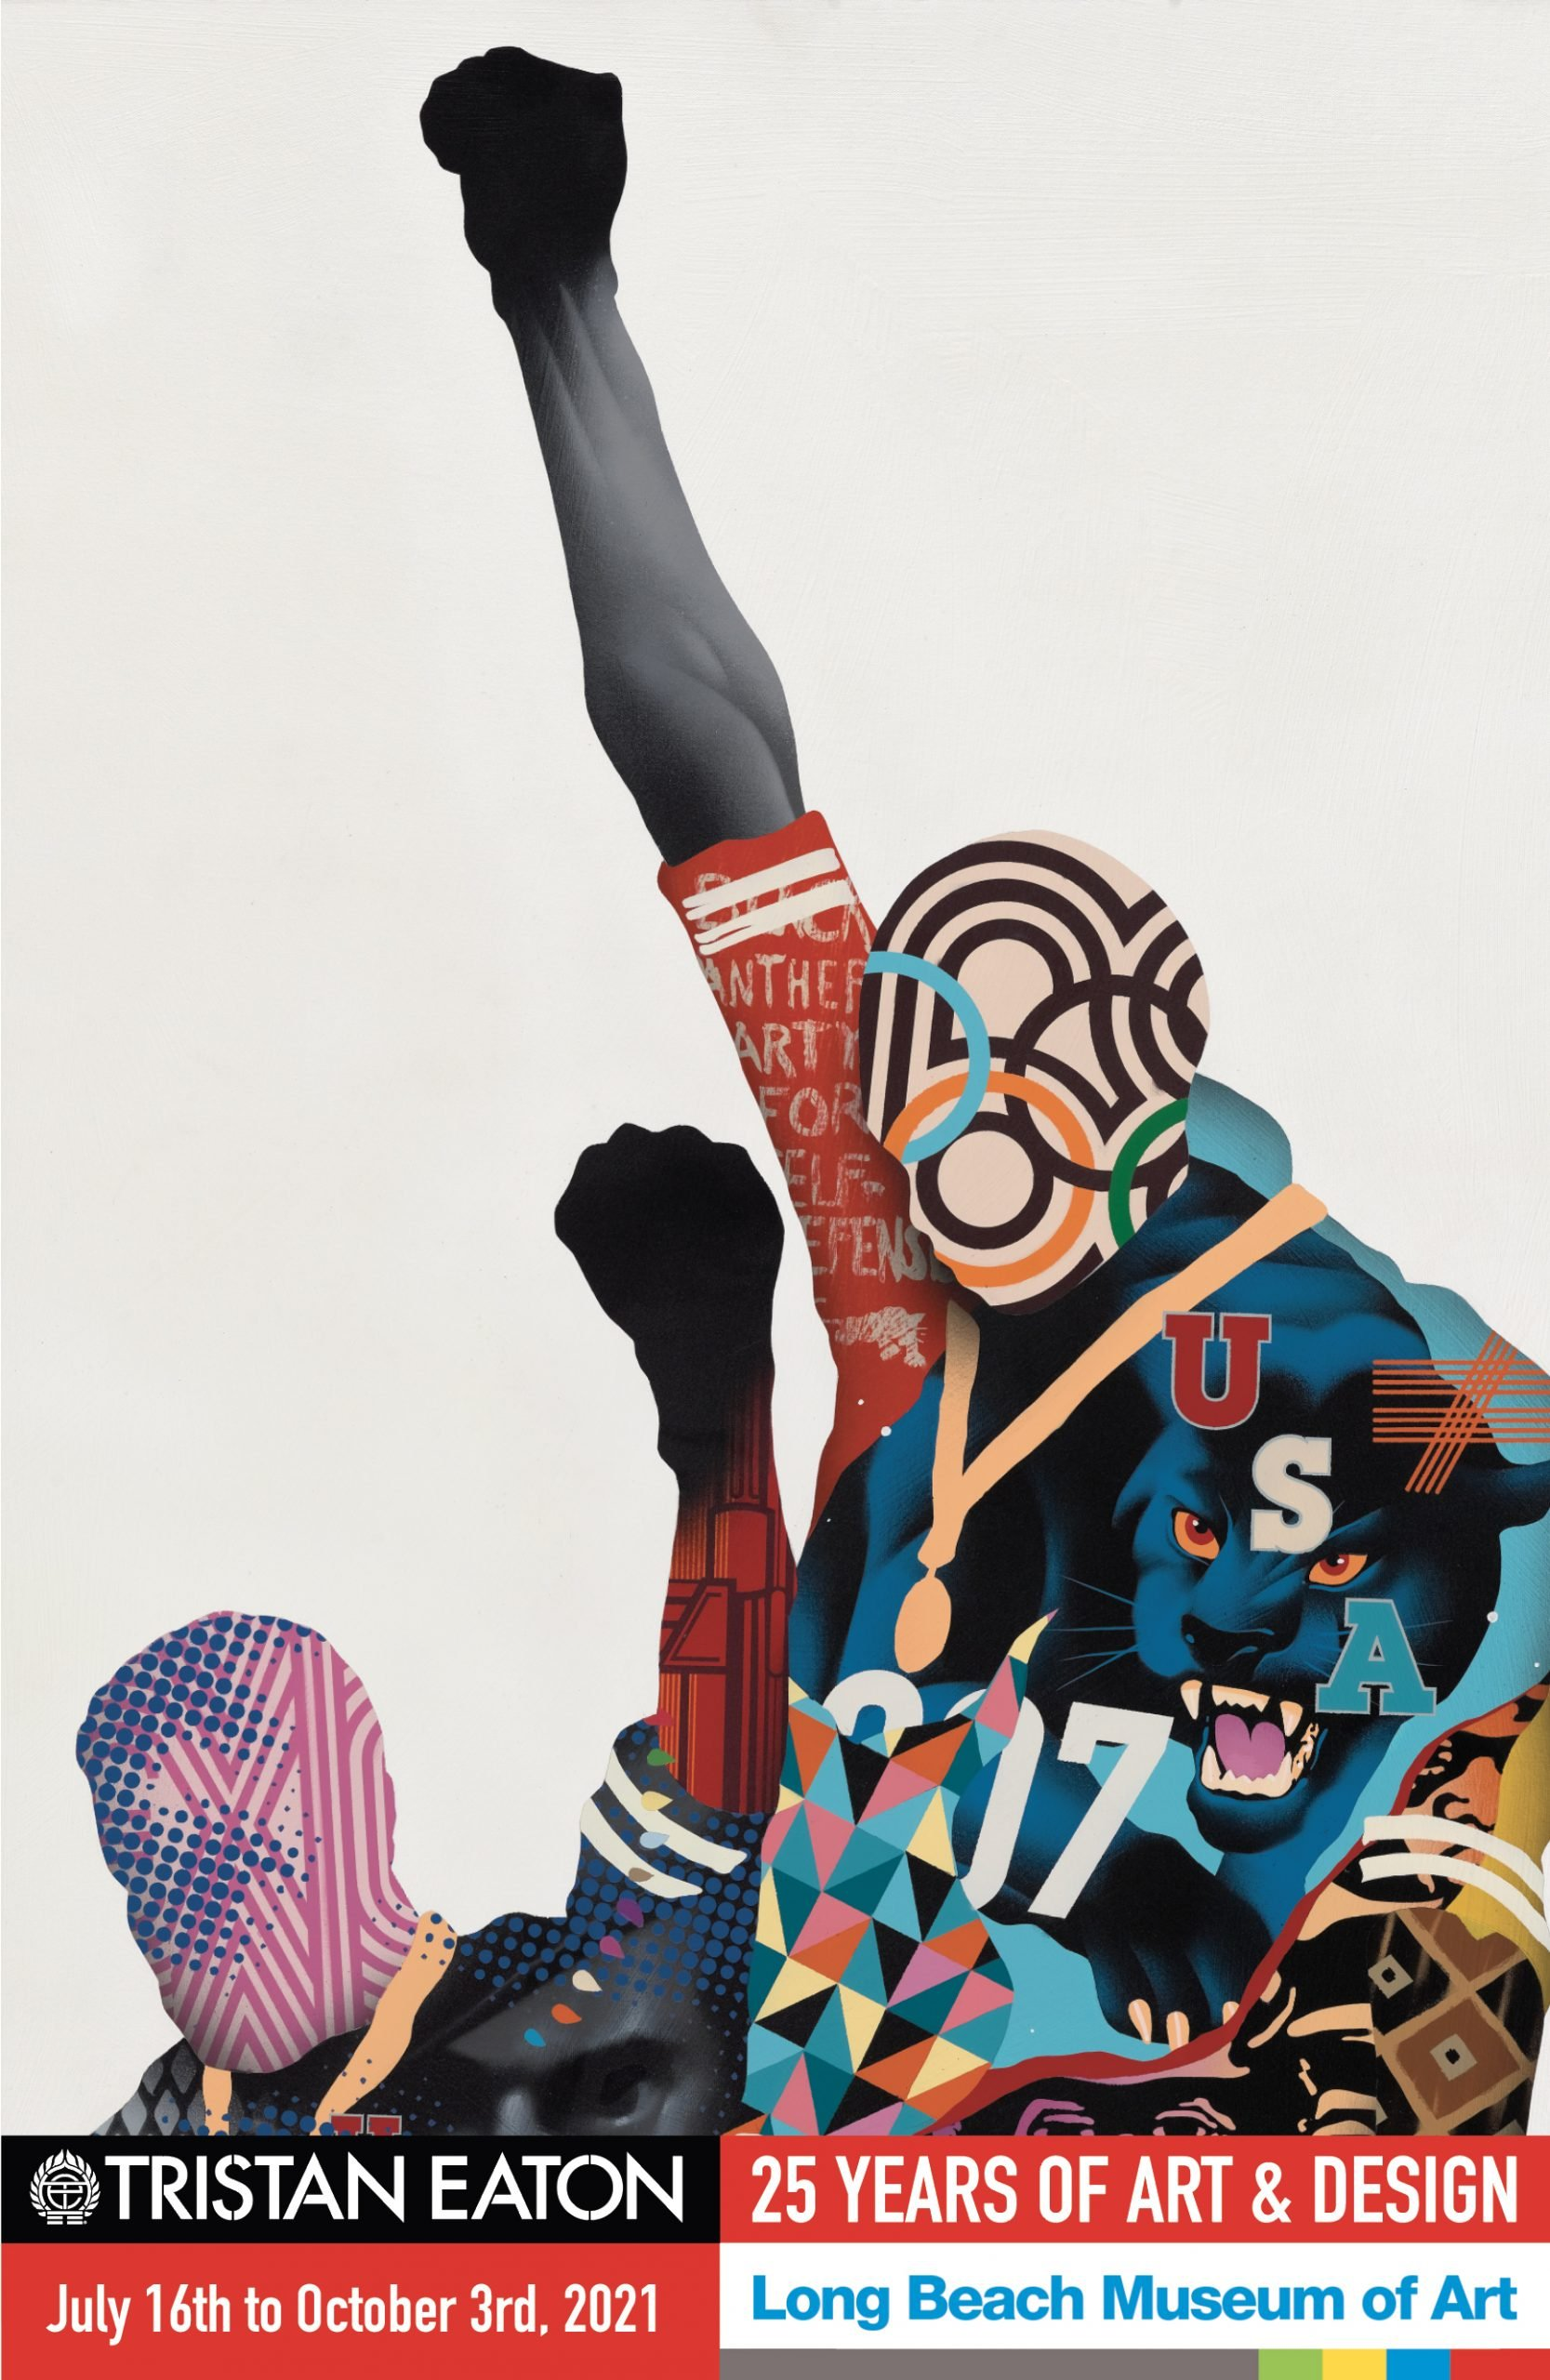 Tristan Eaton retrospective at Long Beach Museum of Art